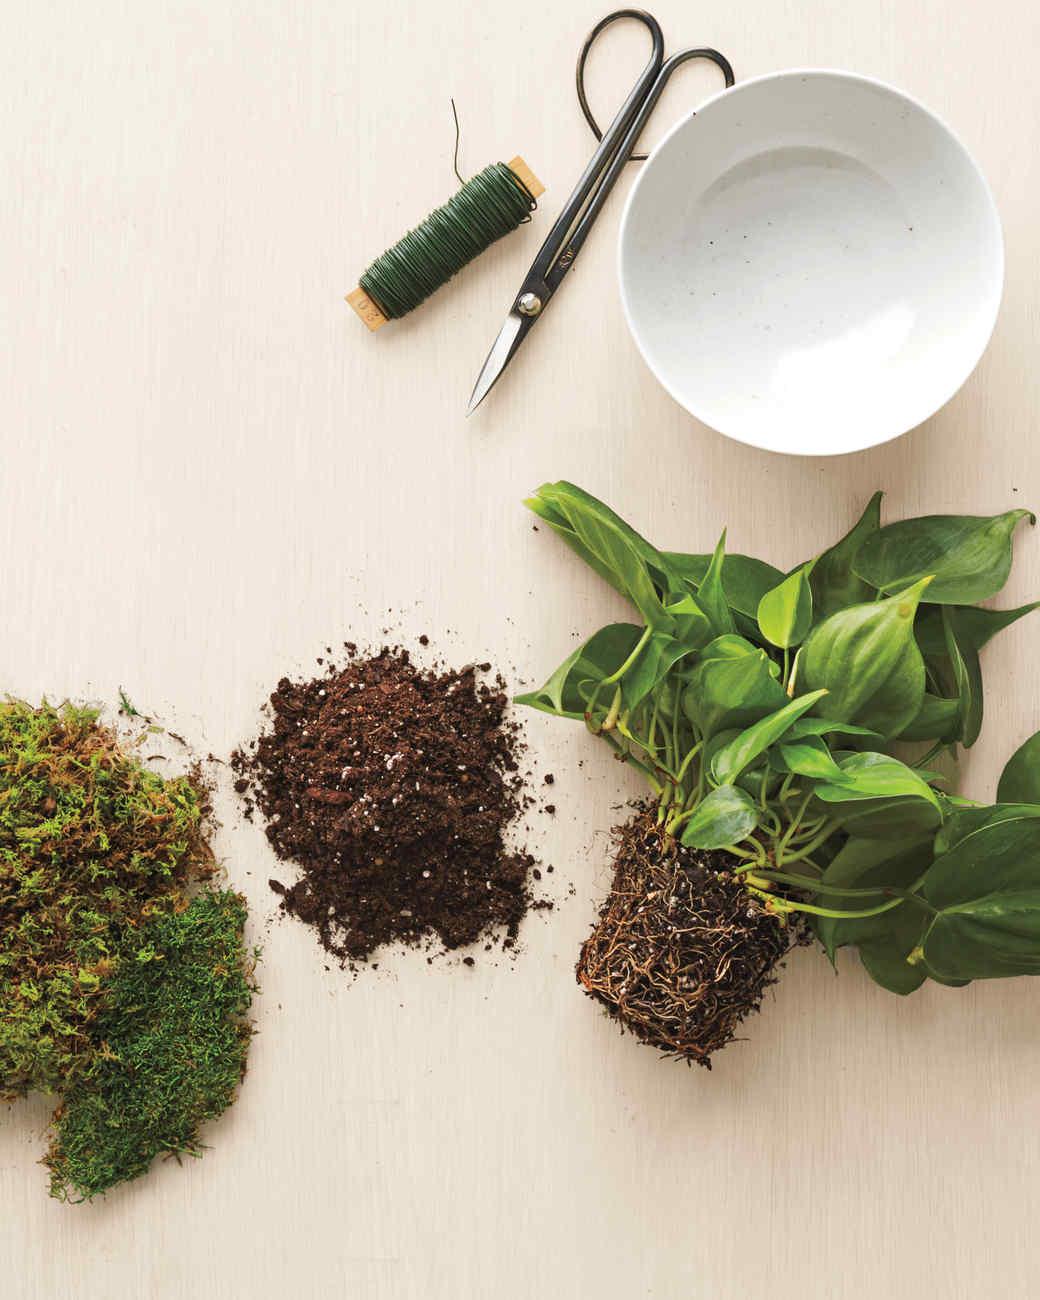 Kokedama A Japanese Gardening Technique That S Diy